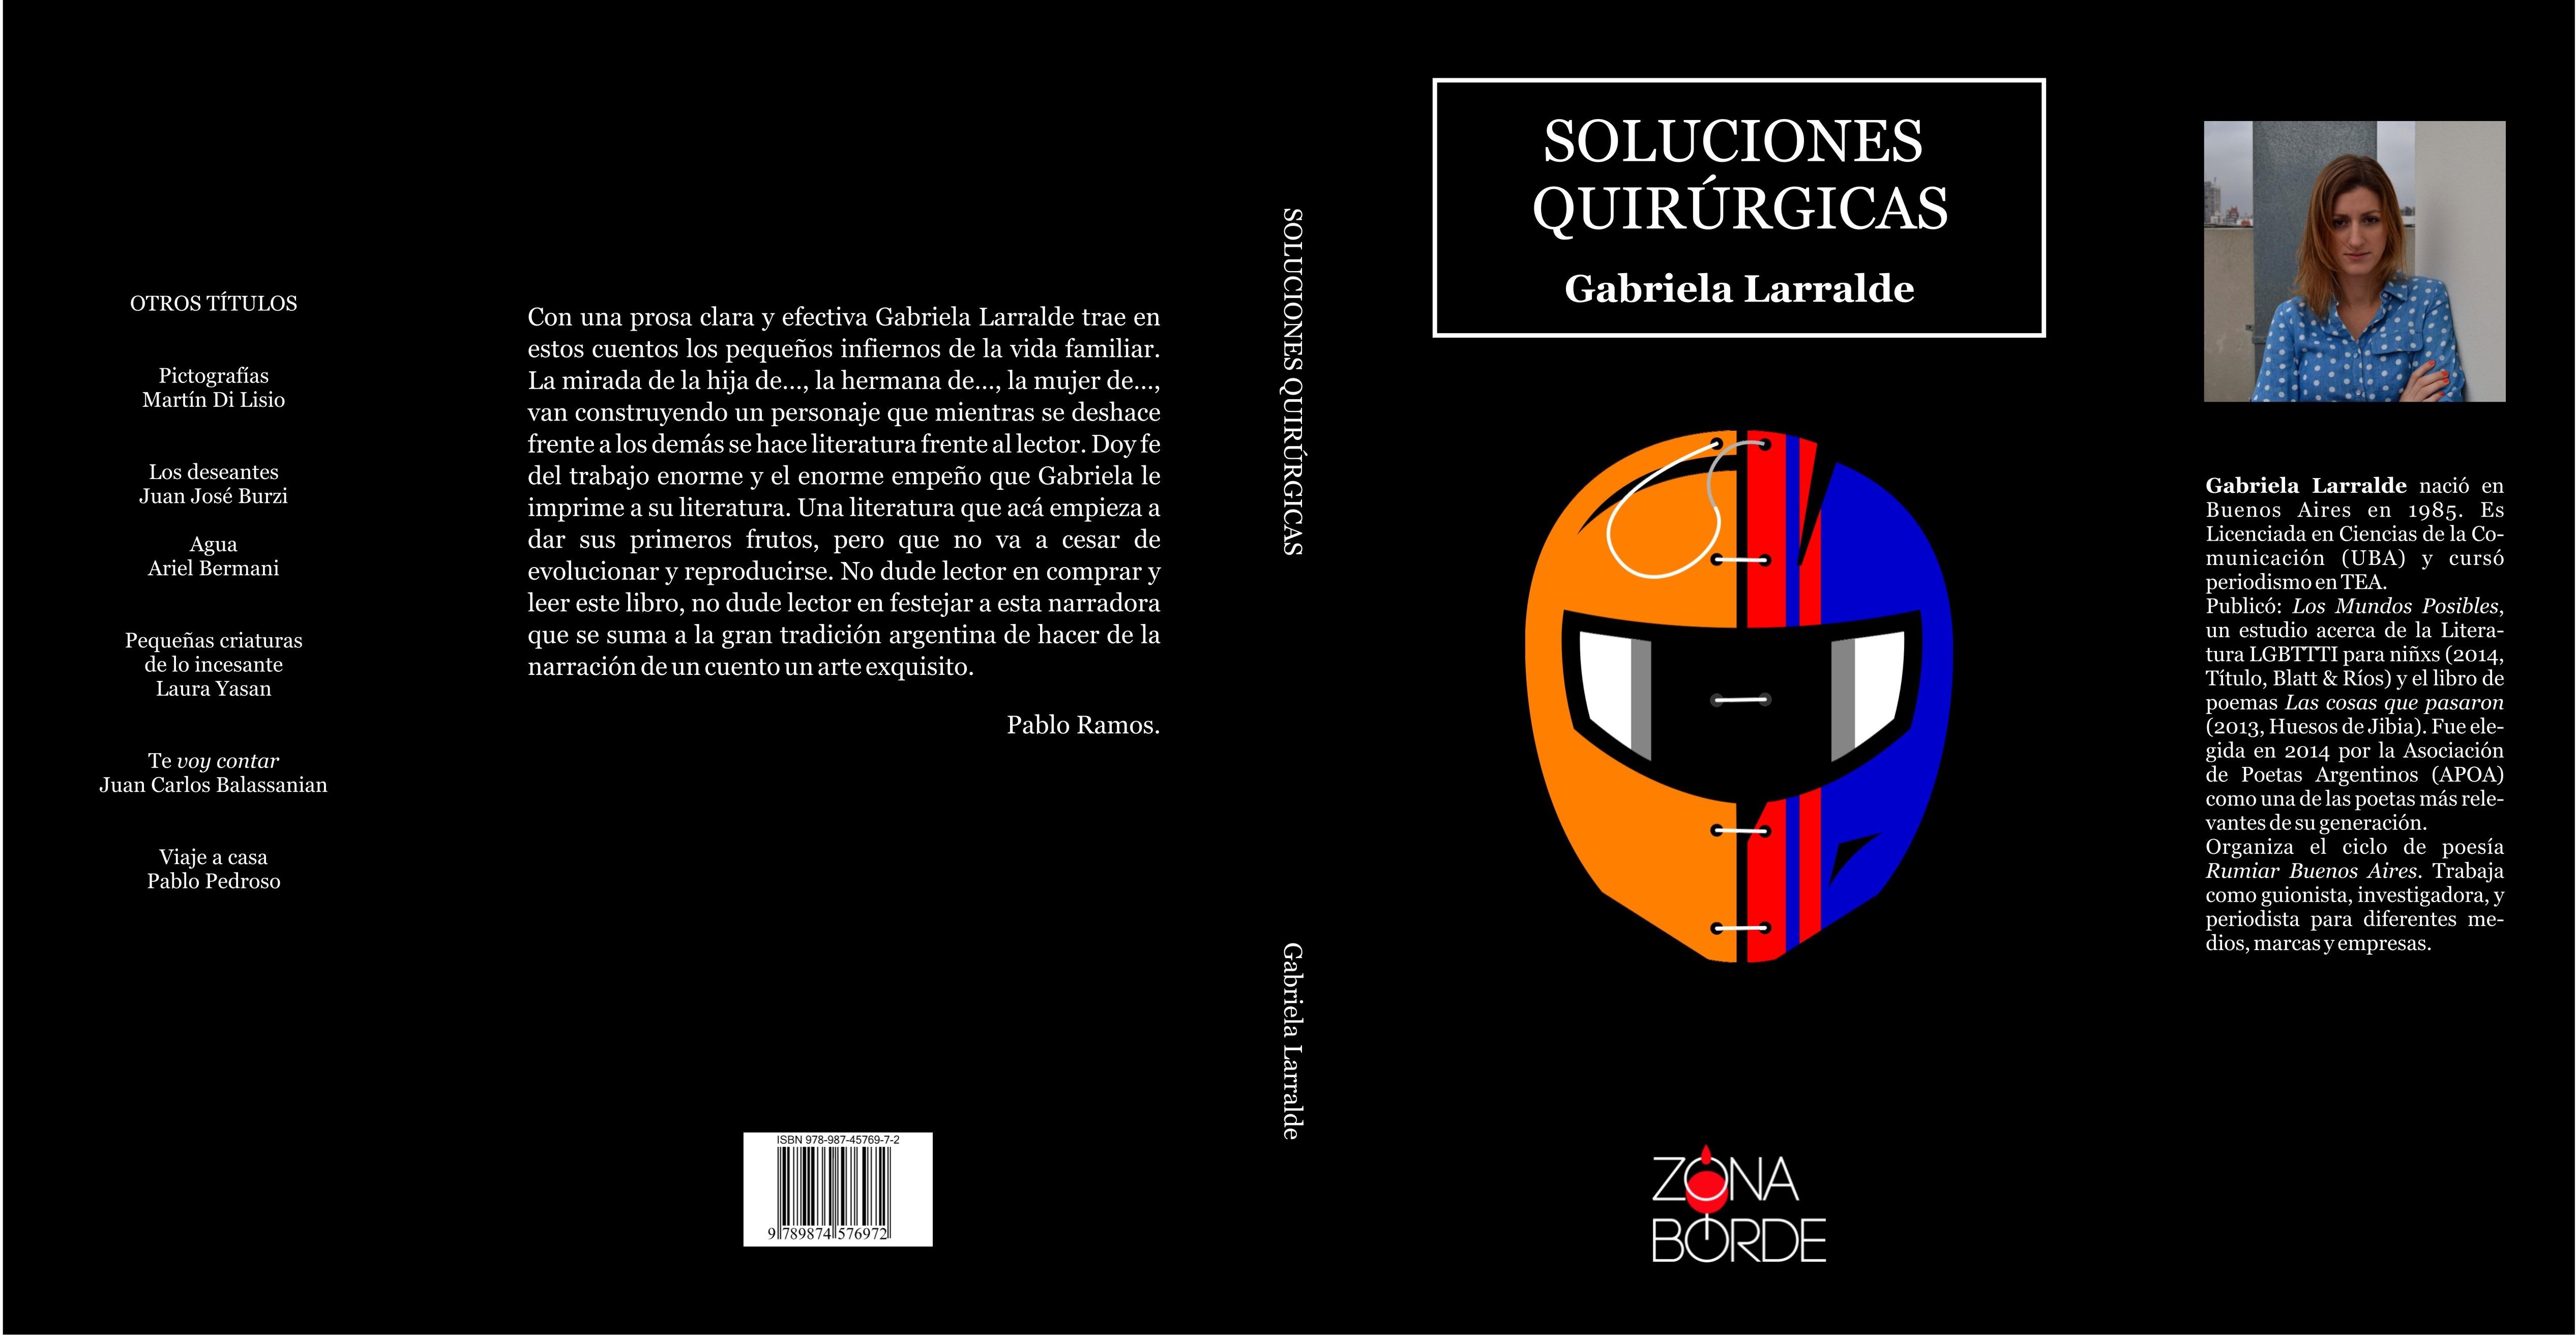 soluciones-quirurgicas-gaby-larralde-tapa